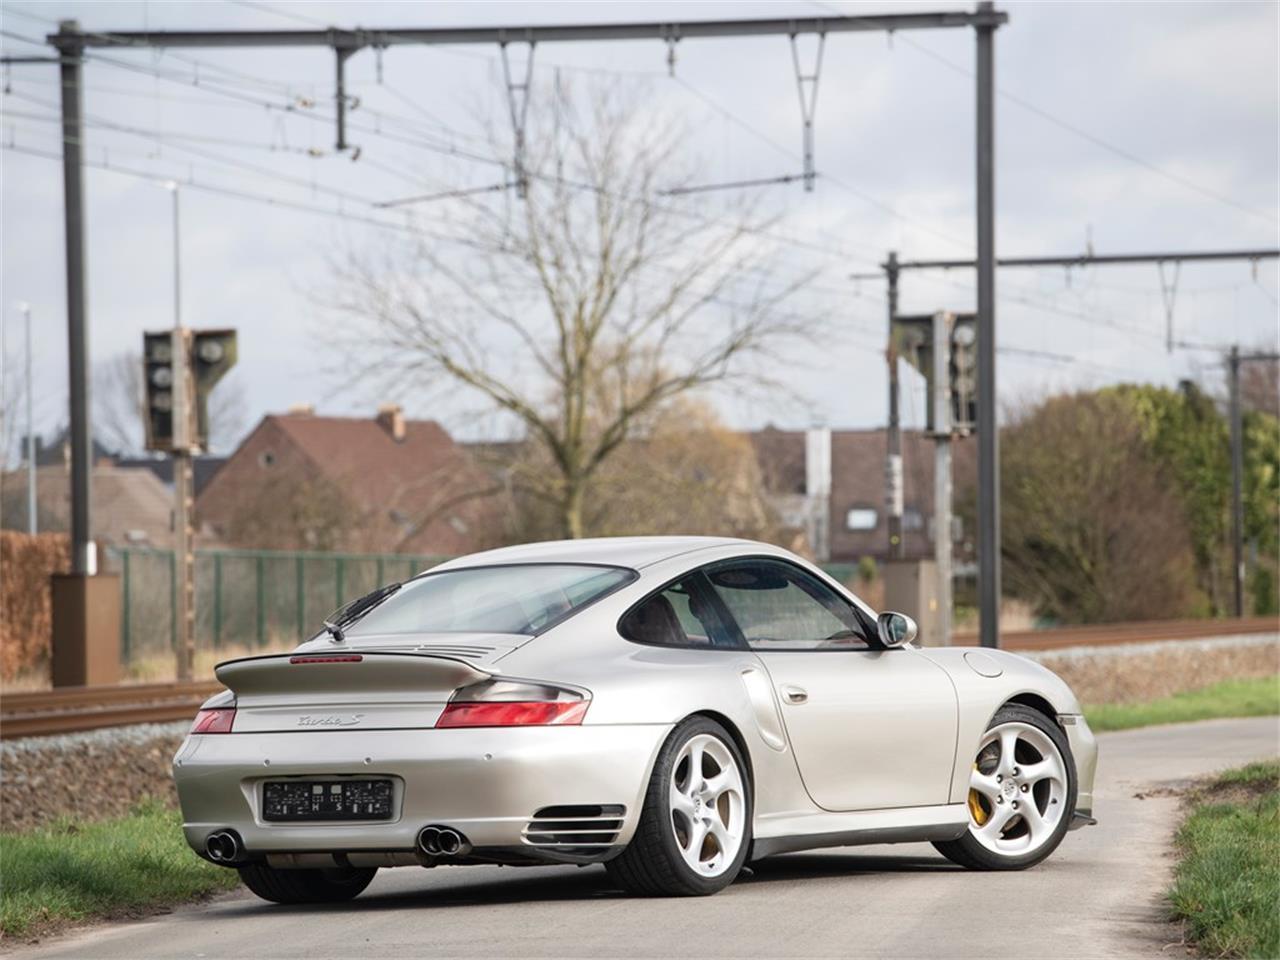 2005 Porsche 911 Turbo (CC-1328099) for sale in Essen, Germany